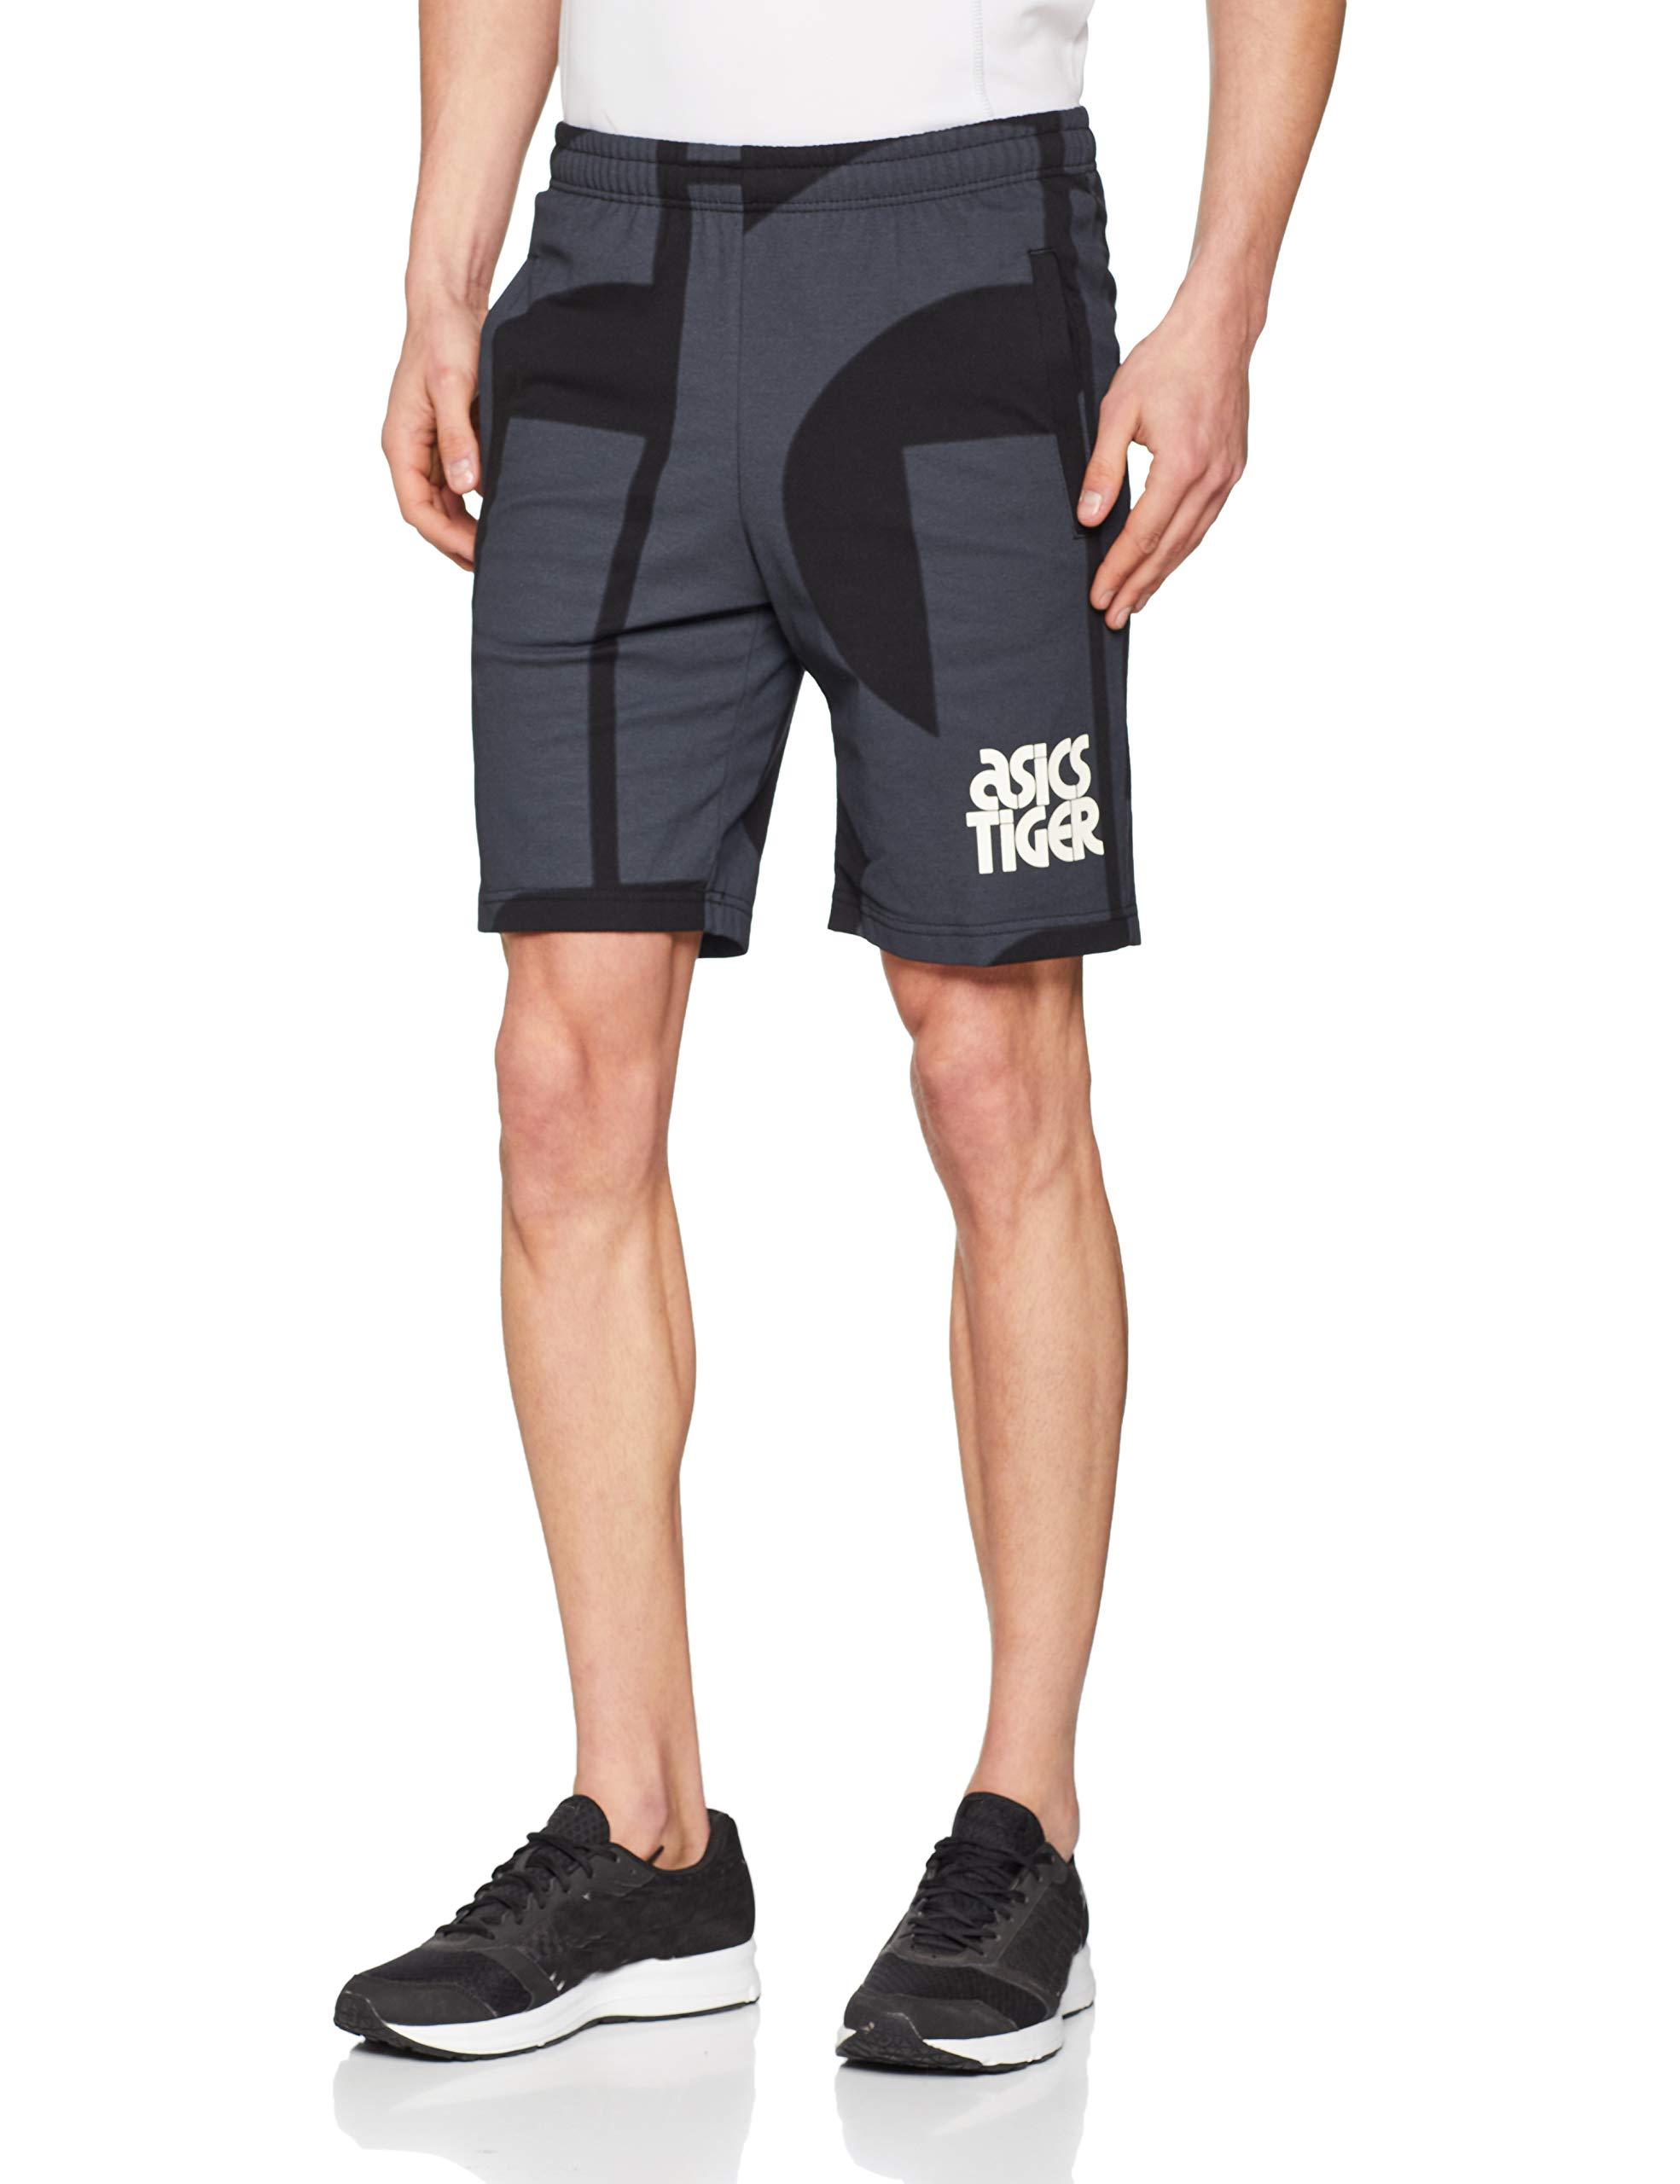 Aop Asics 00140taille Padded Black SportNoirperformance FabricantSmallHomme Shorts PkulXTiwOZ